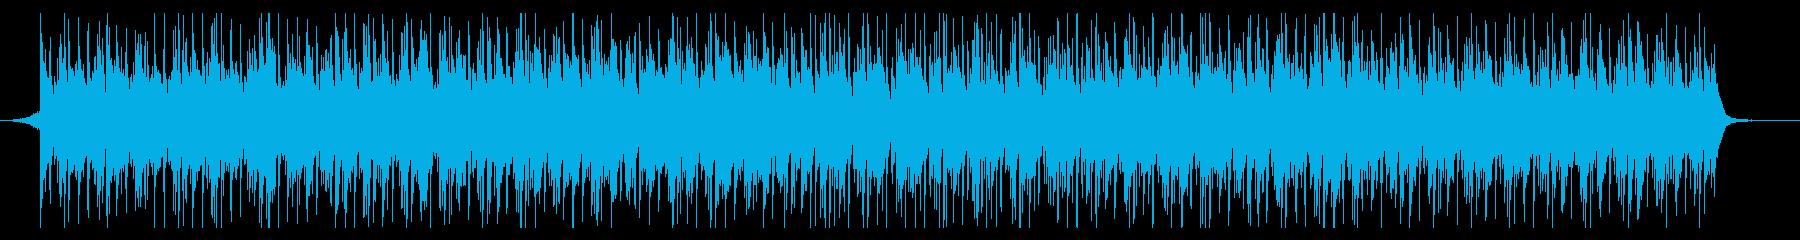 CMやVPに ほのぼの口笛ポップで明るいの再生済みの波形